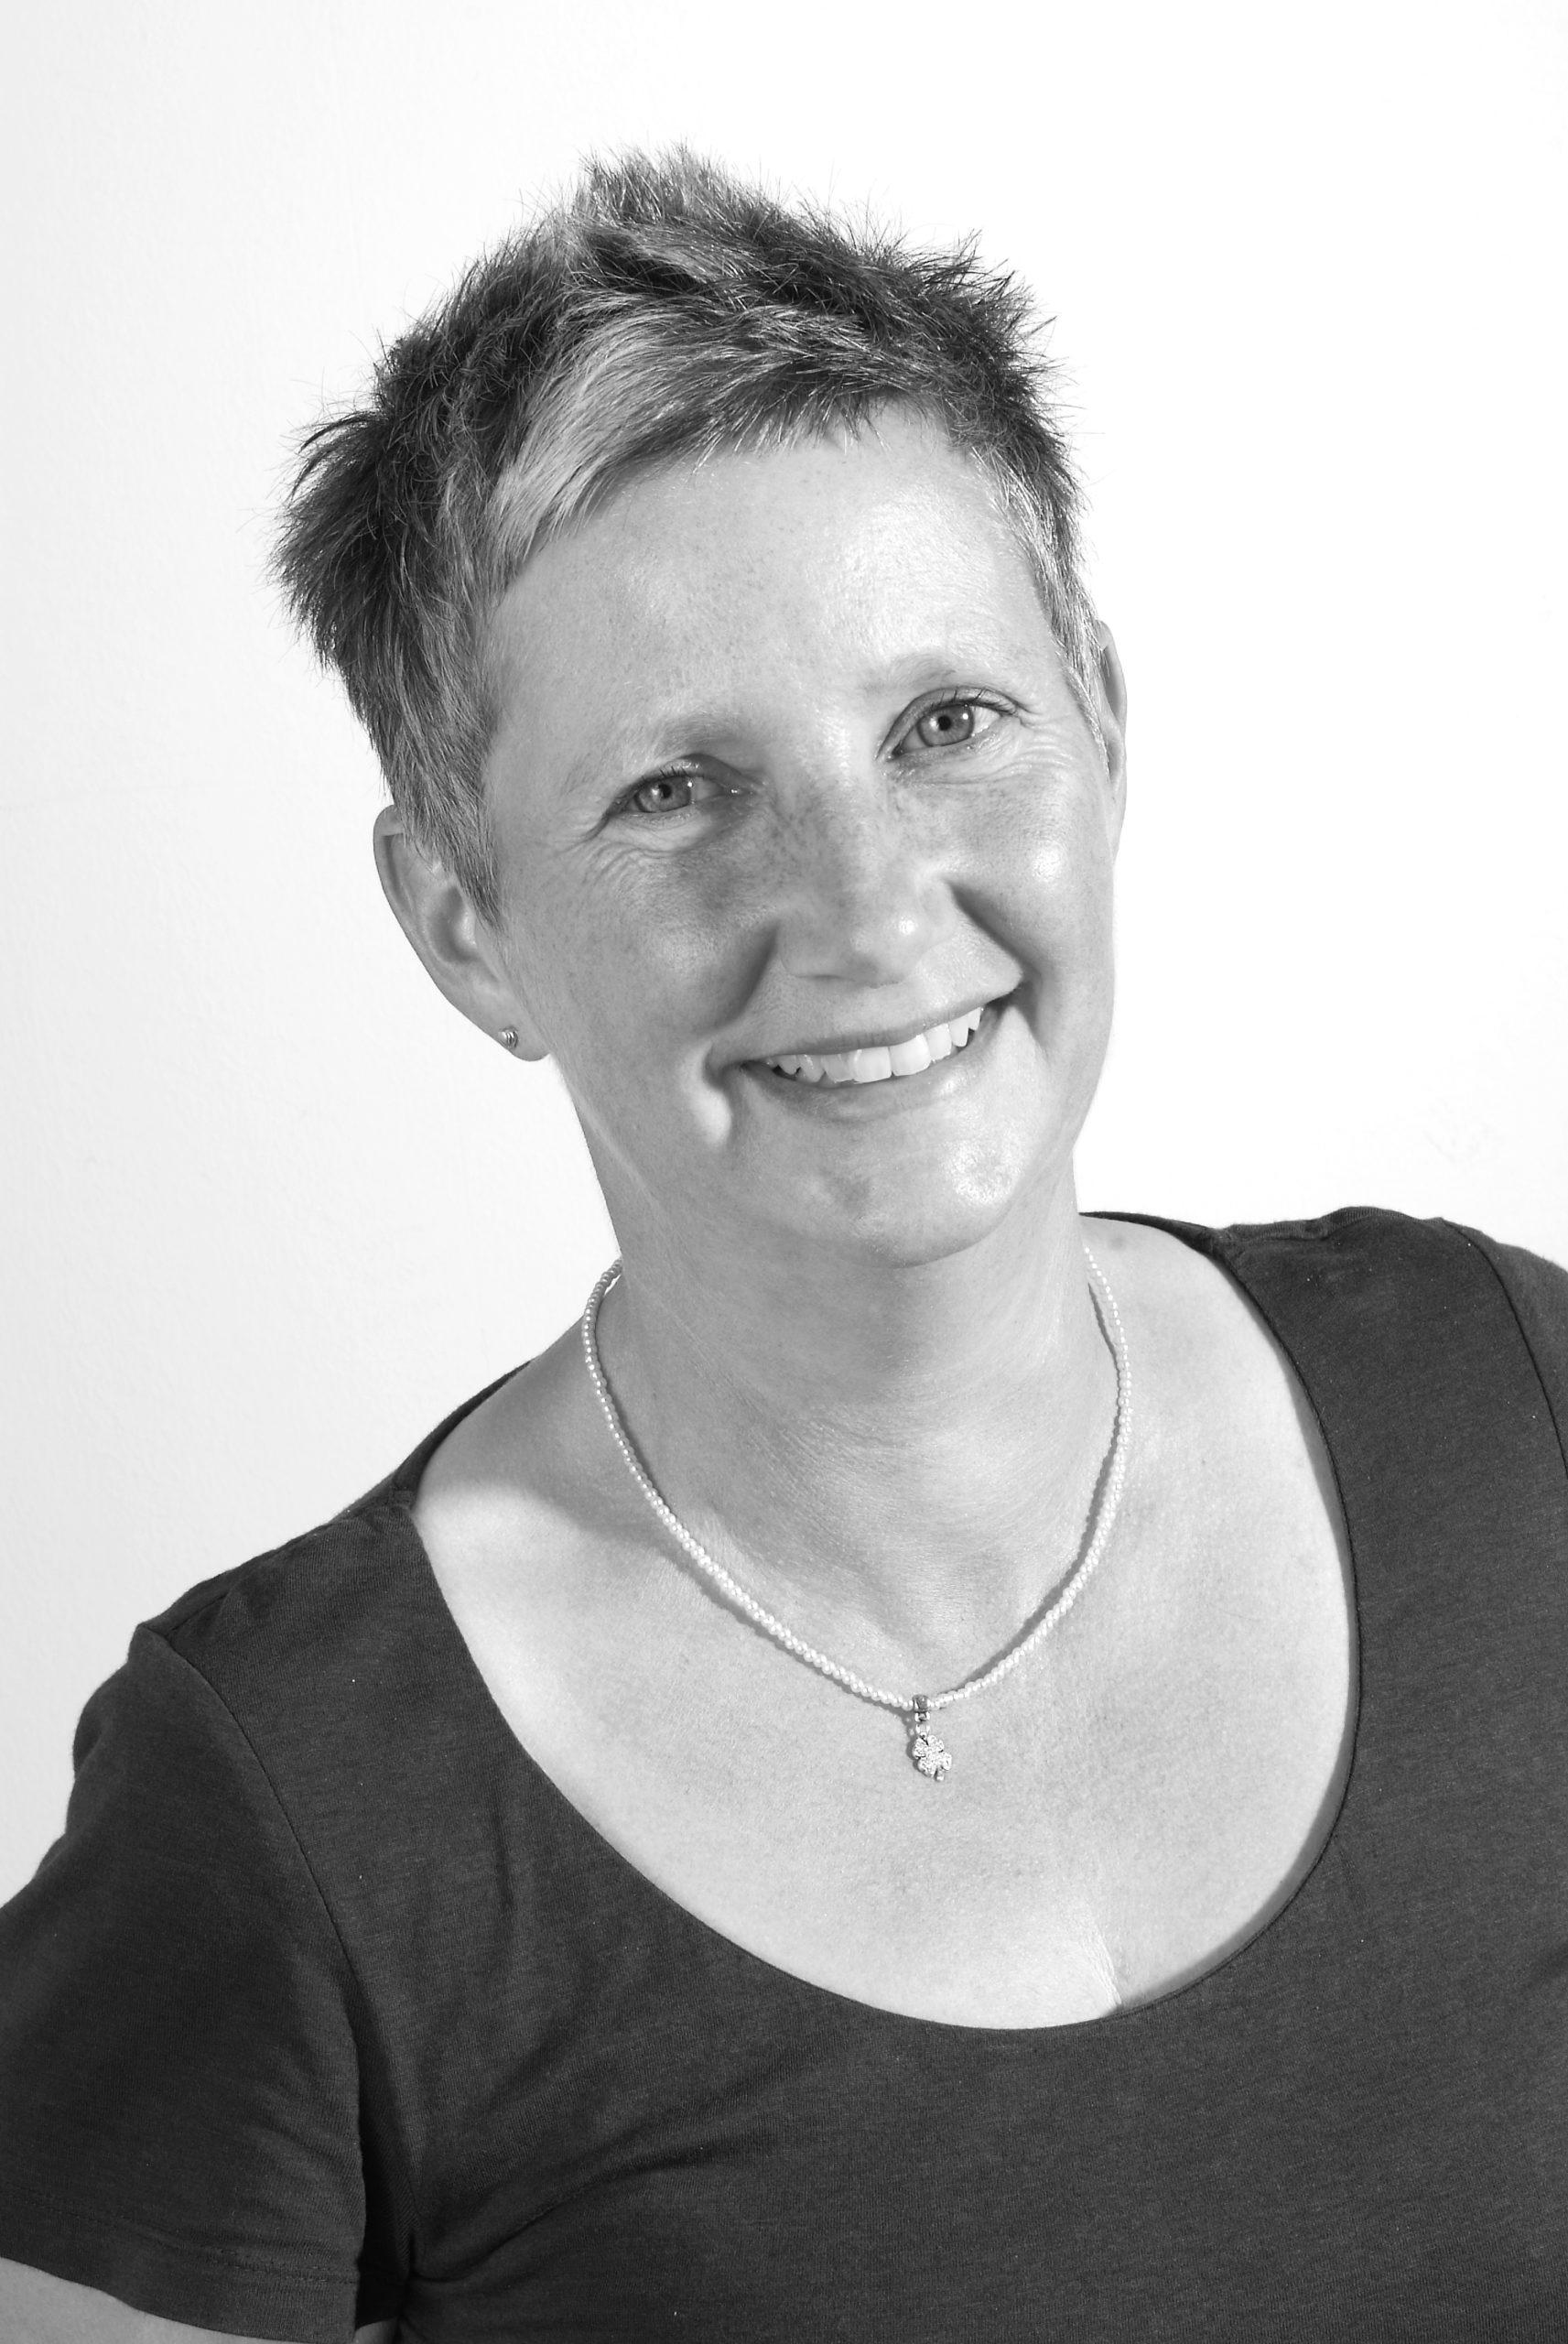 Trudi Boukens